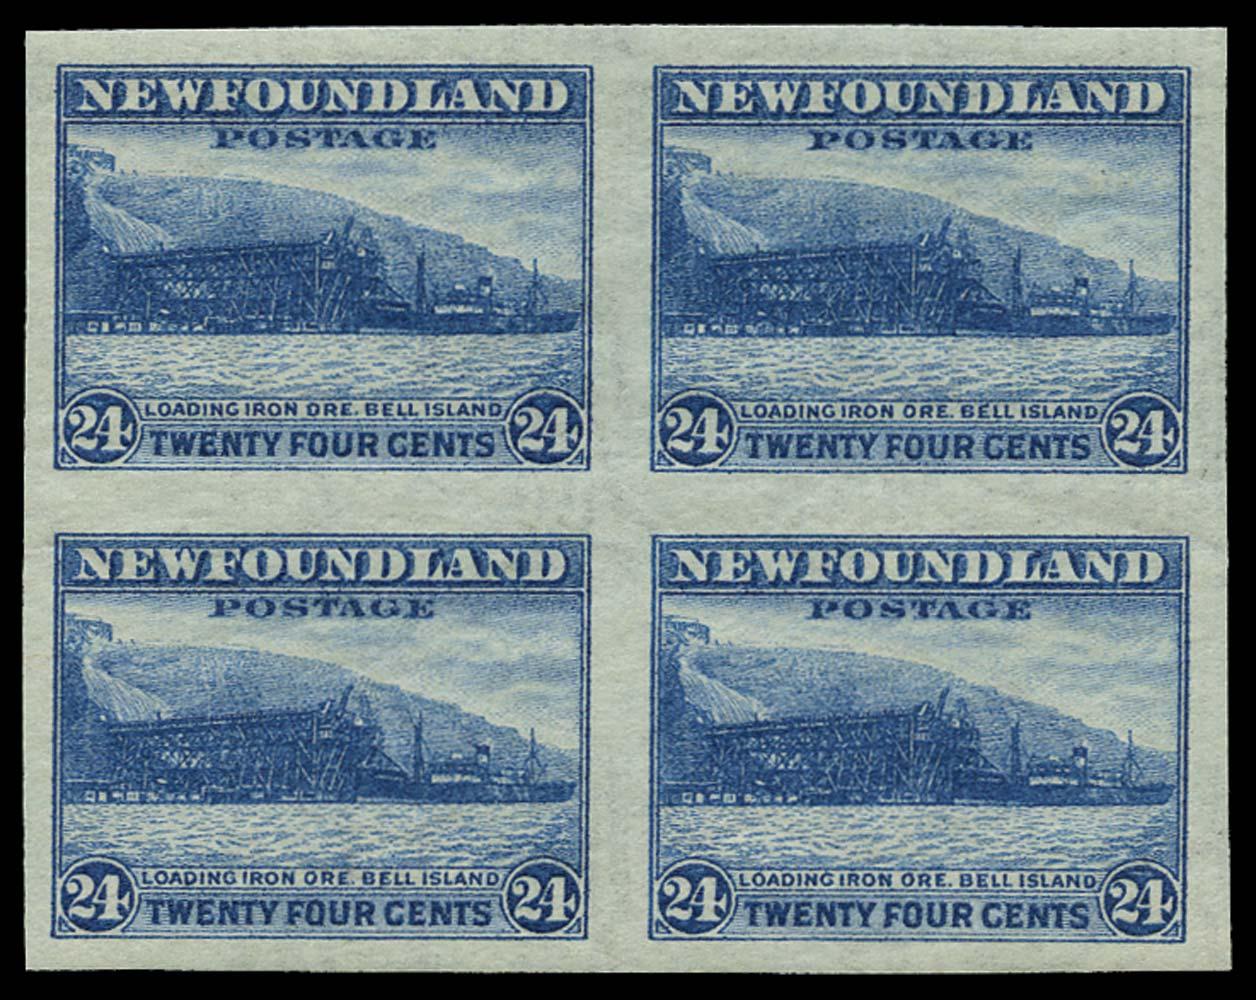 NEWFOUNDLAND 1932  SG228a Mint